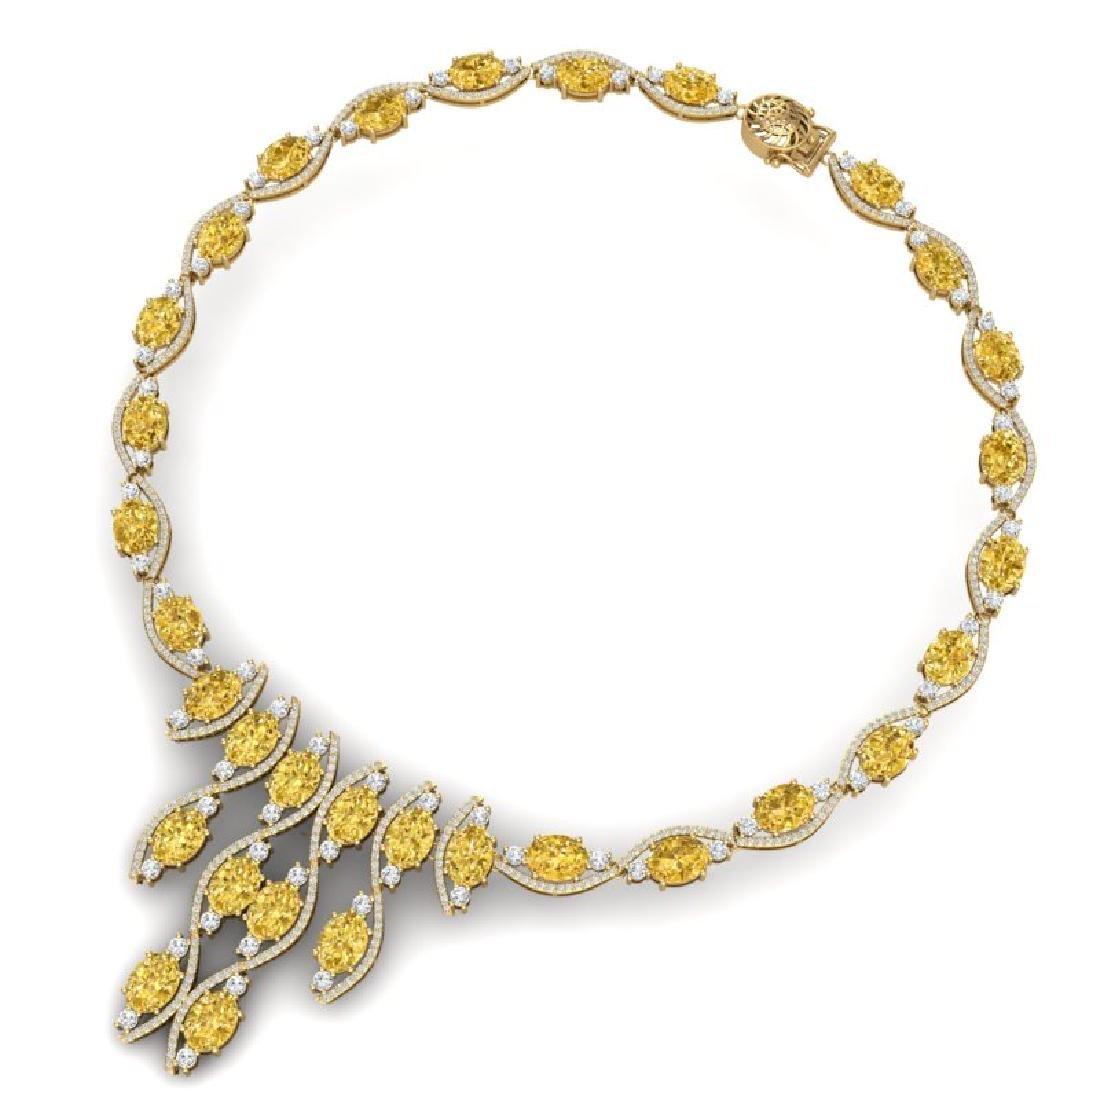 64.04 CTW Royalty Canary Citrine & VS Diamond Necklace - 3